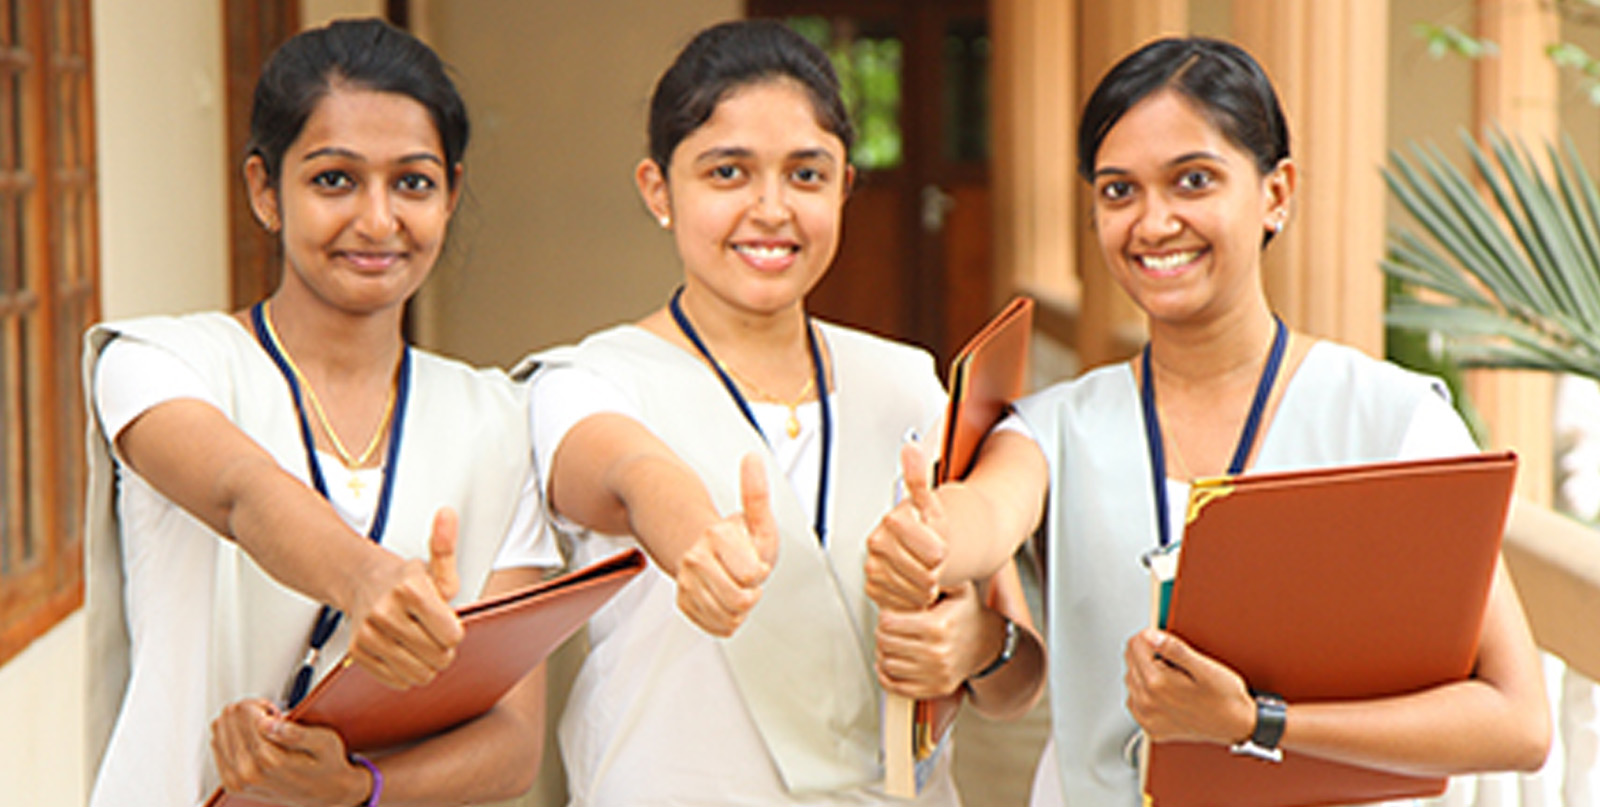 Doon Institute of Medical Science Faculty of Nursing, Dehradun Image